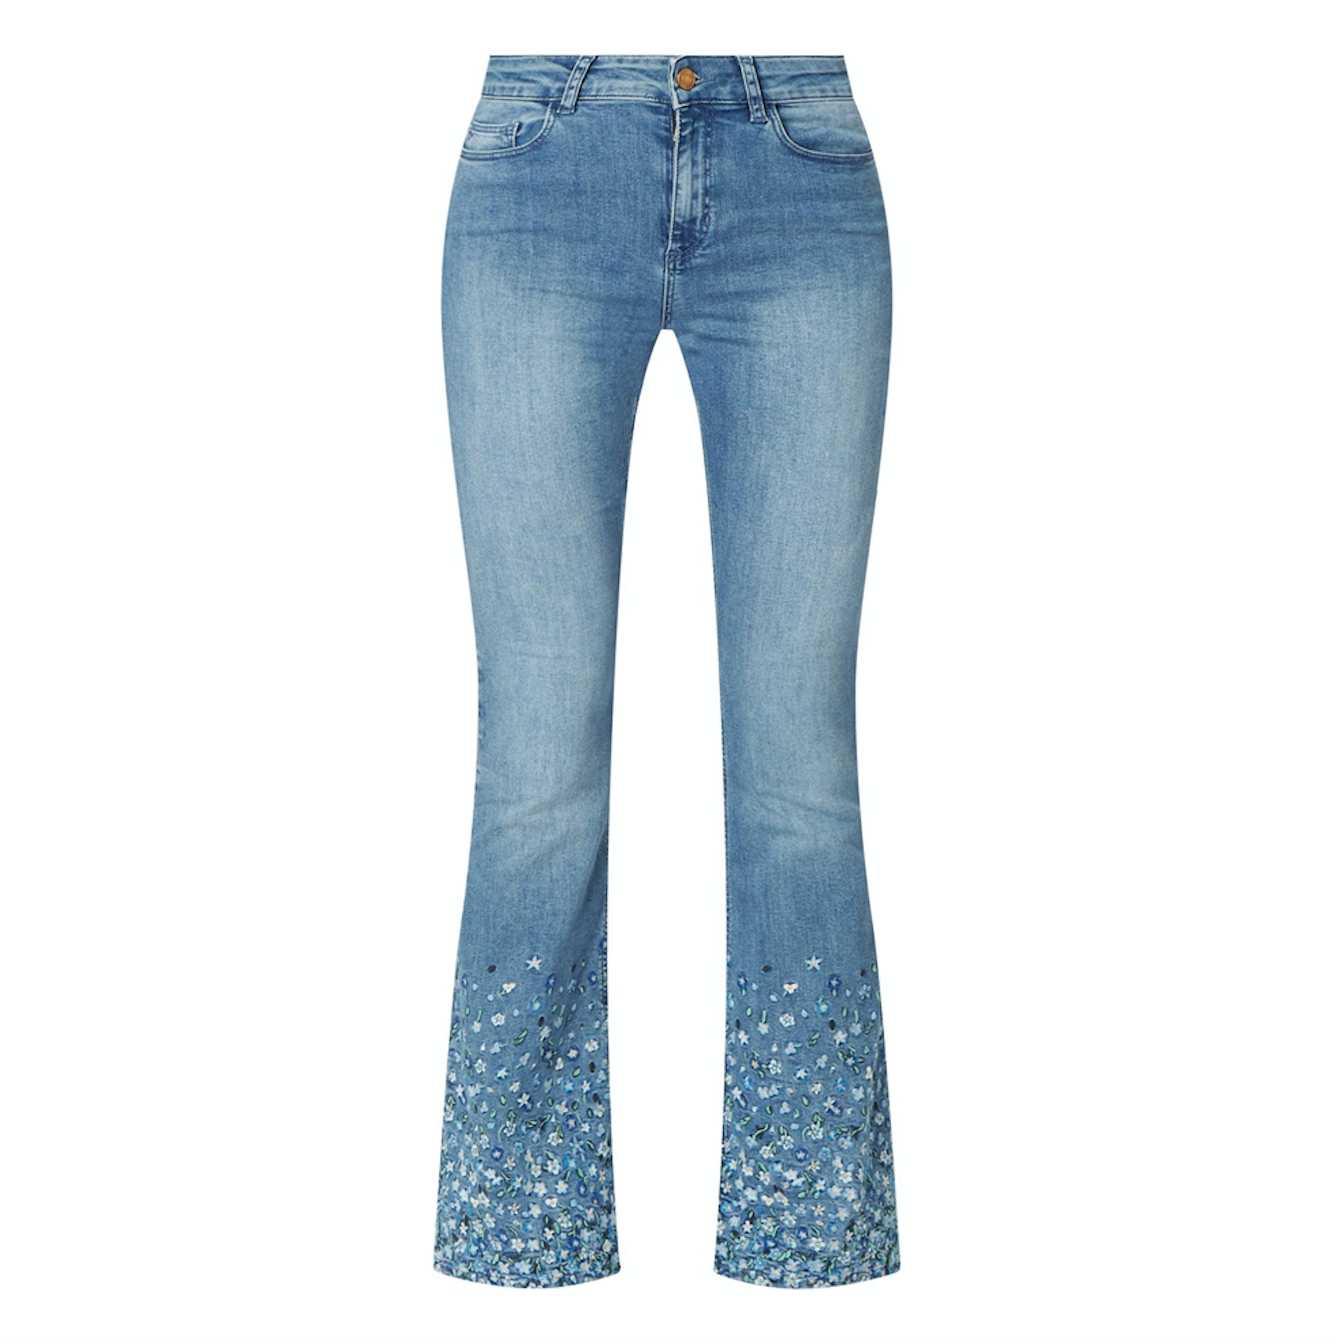 Arnotts, Fabienne Chapot Eva Flare Jeans, €147